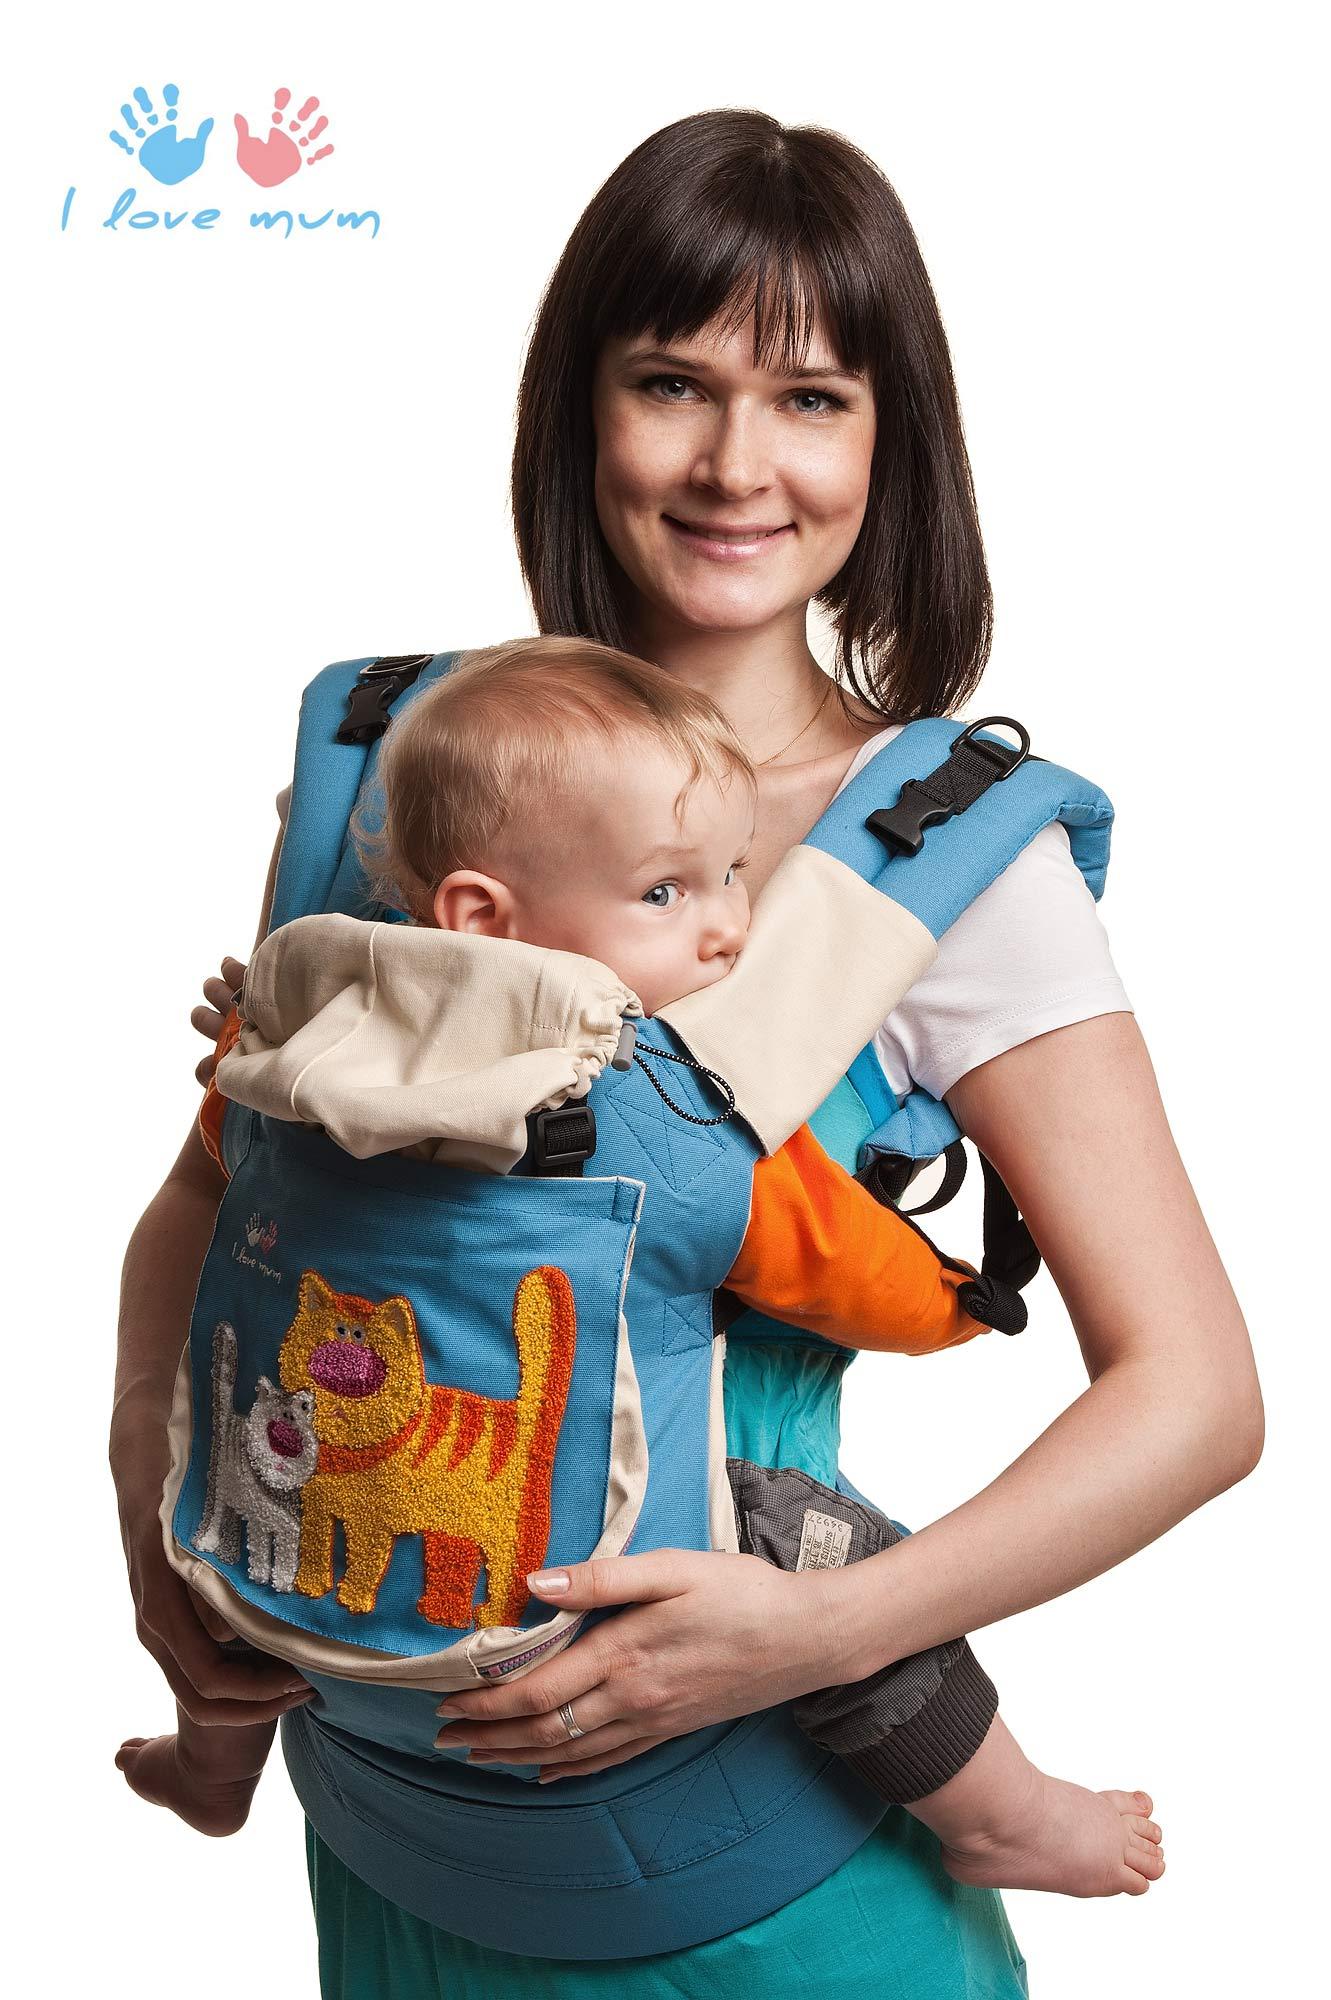 Слинг-рюкзак амаэру бали, новый рюкзак колибри color me mine simba